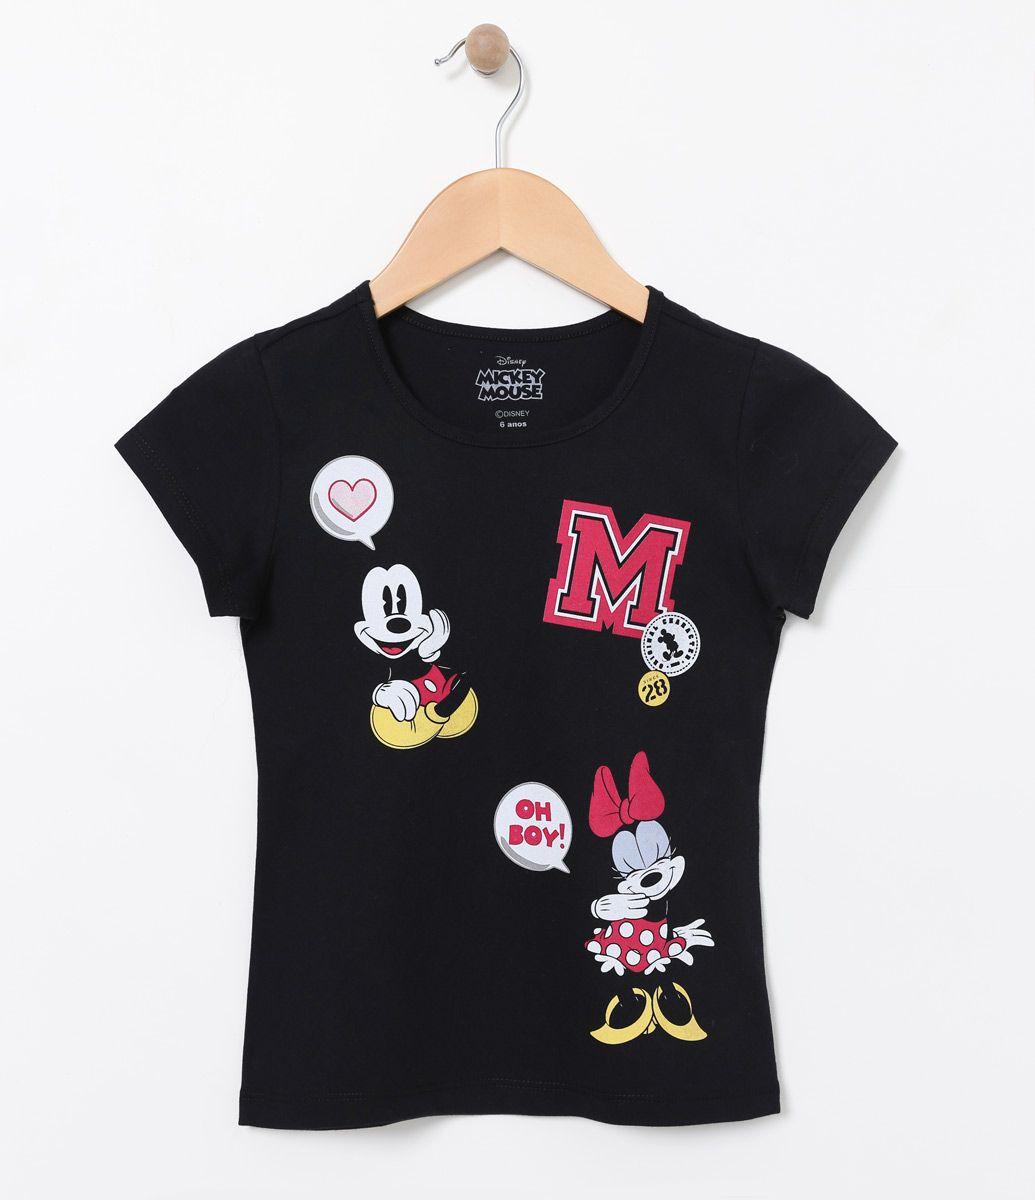 0876193eeb4016 Camiseta Infantil Manga curta Gola redonda Com estampa Marca: Mickey ...